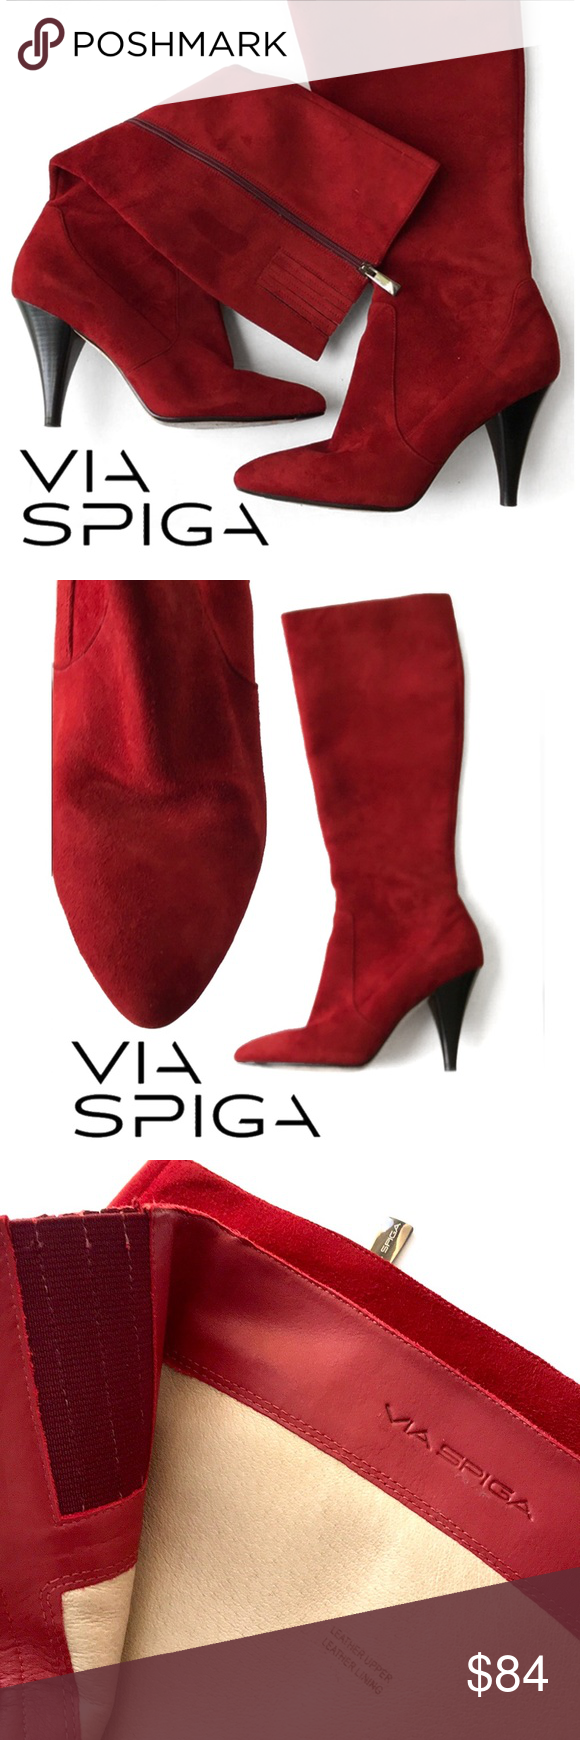 Via Spiga Shanti Red Suede Knee High Zipper Boots Zipper Boots Red Suede Shoes Women Heels